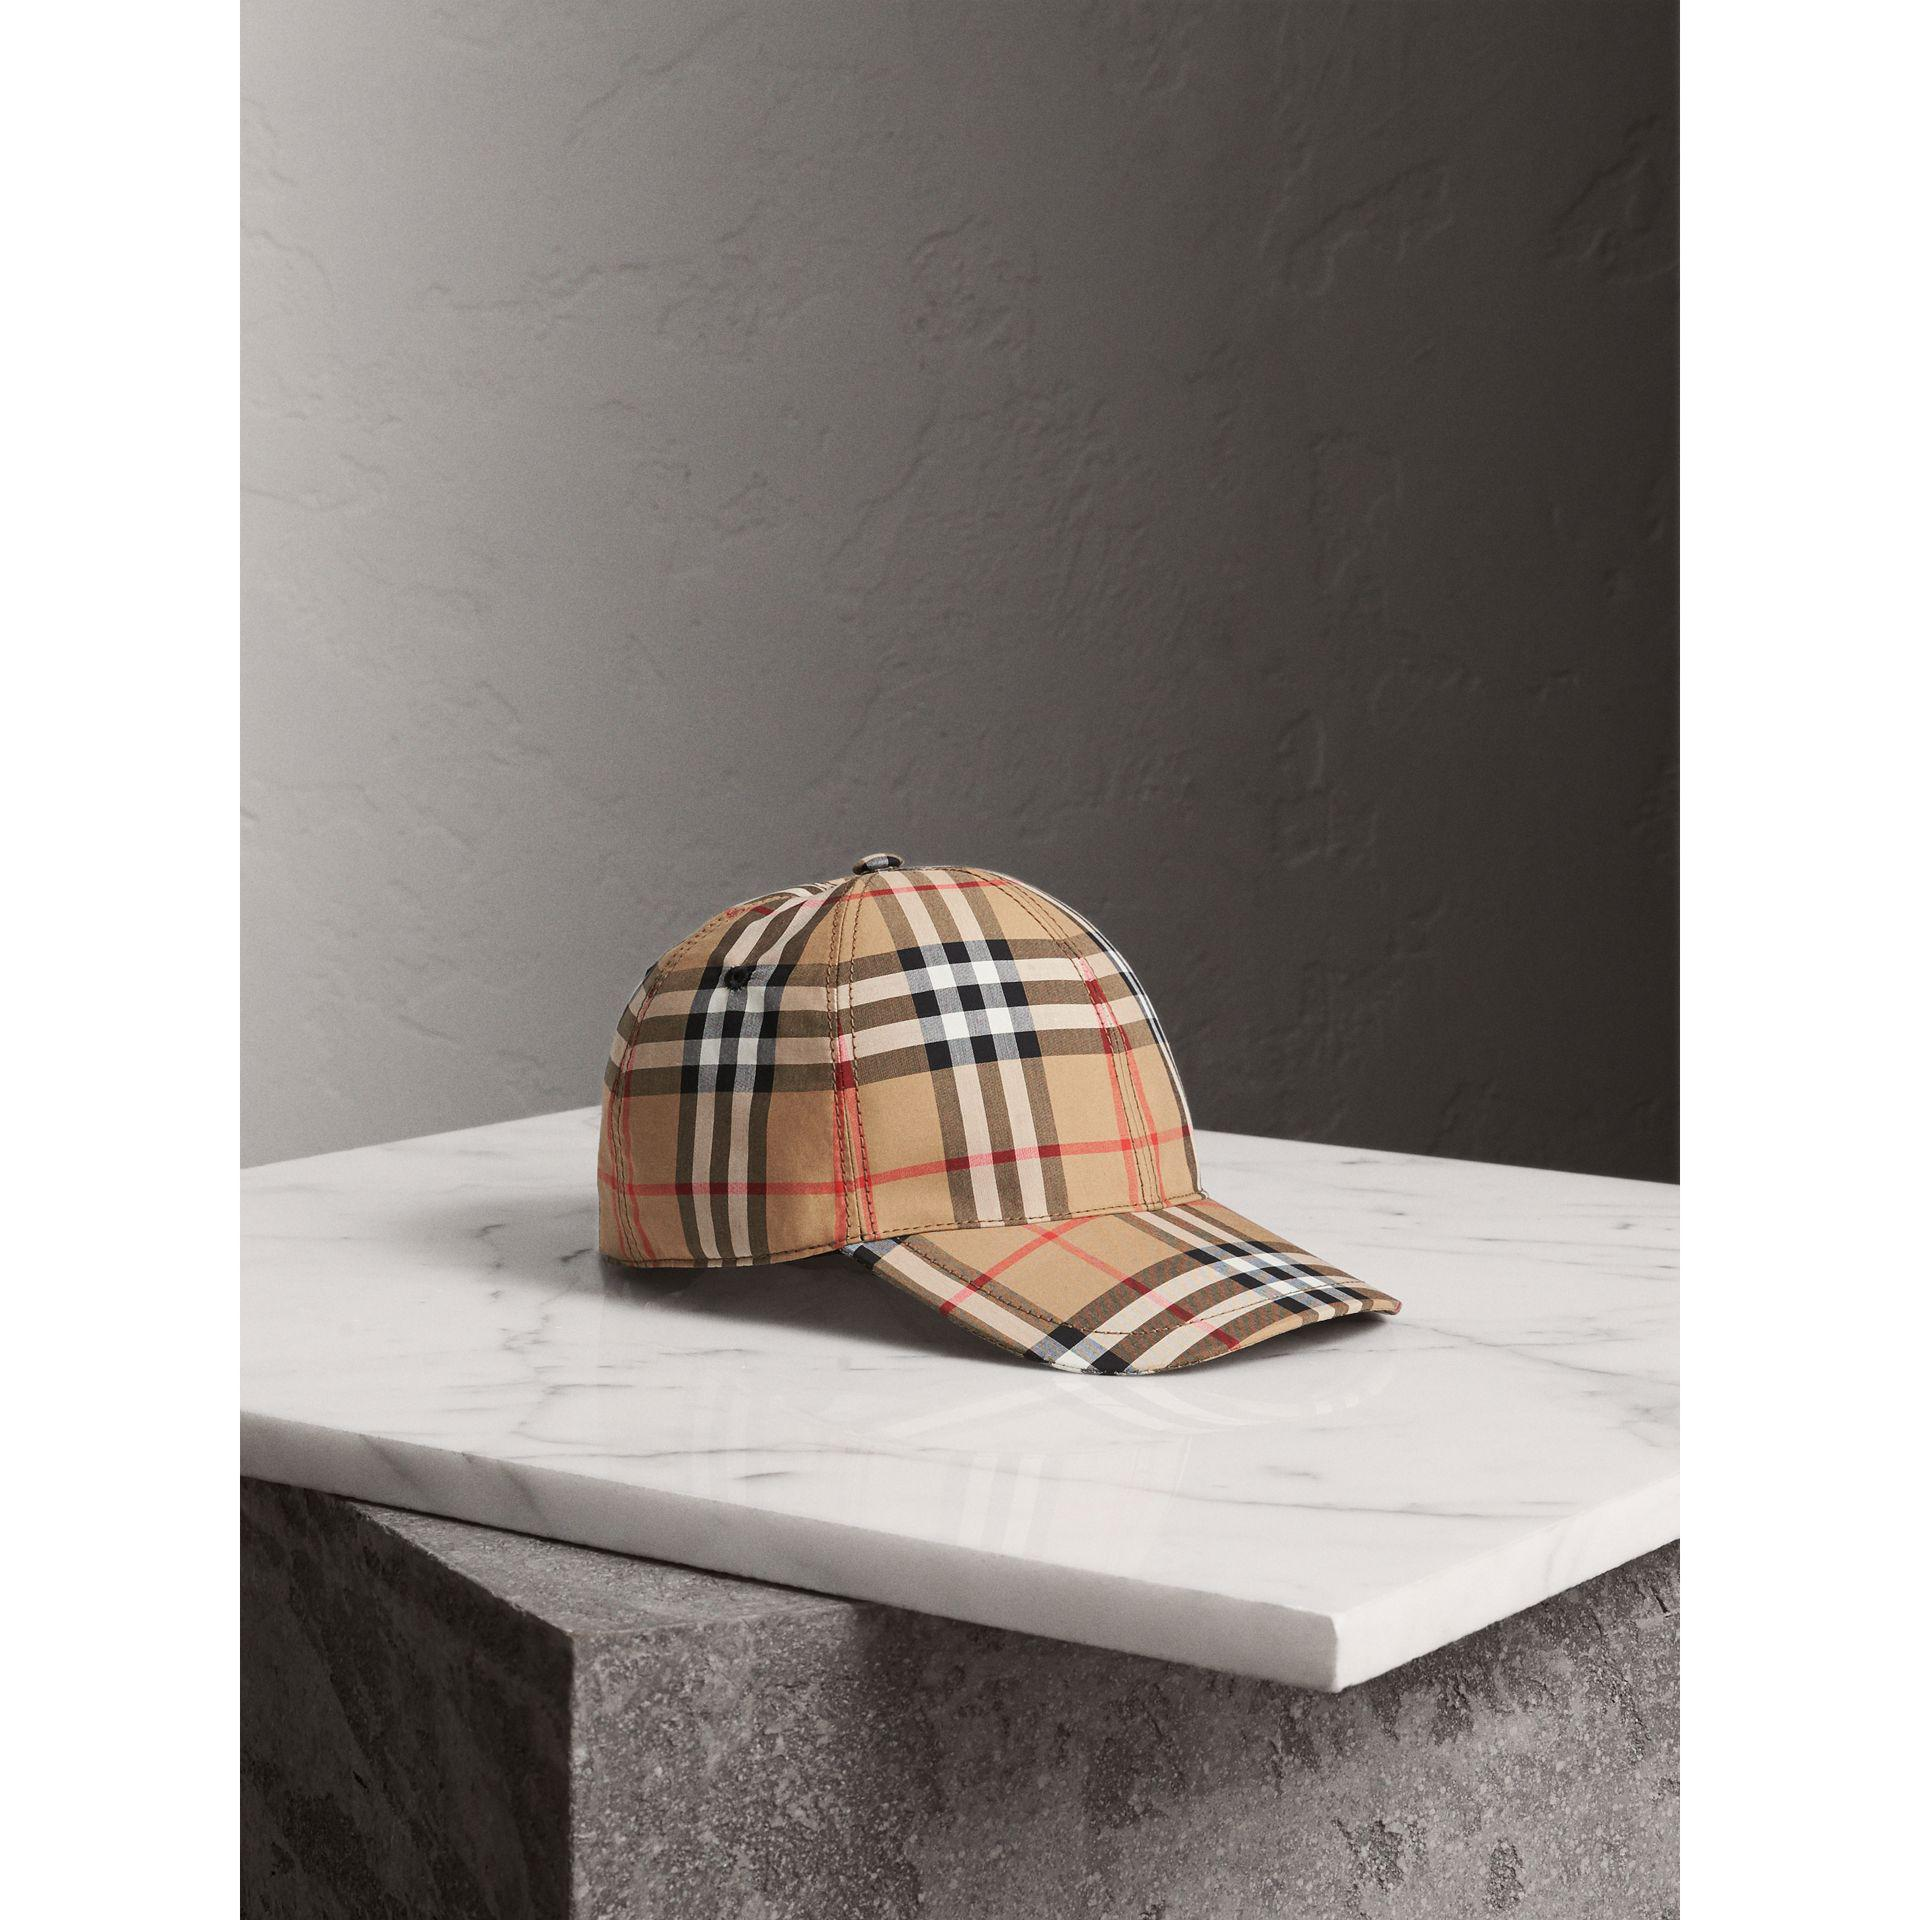 072d31a1102 Lyst - Burberry Vintage Check Baseball Cap